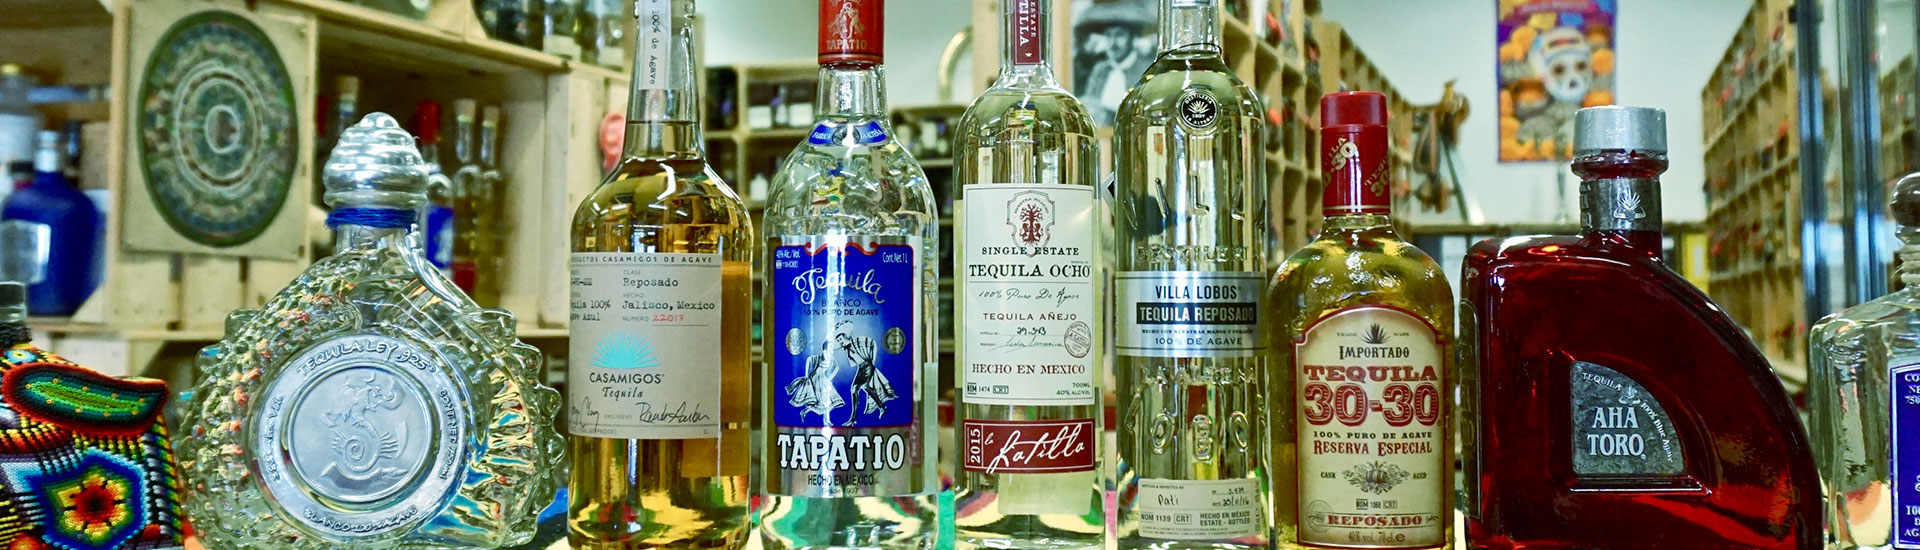 Casa del Tequila - Messen